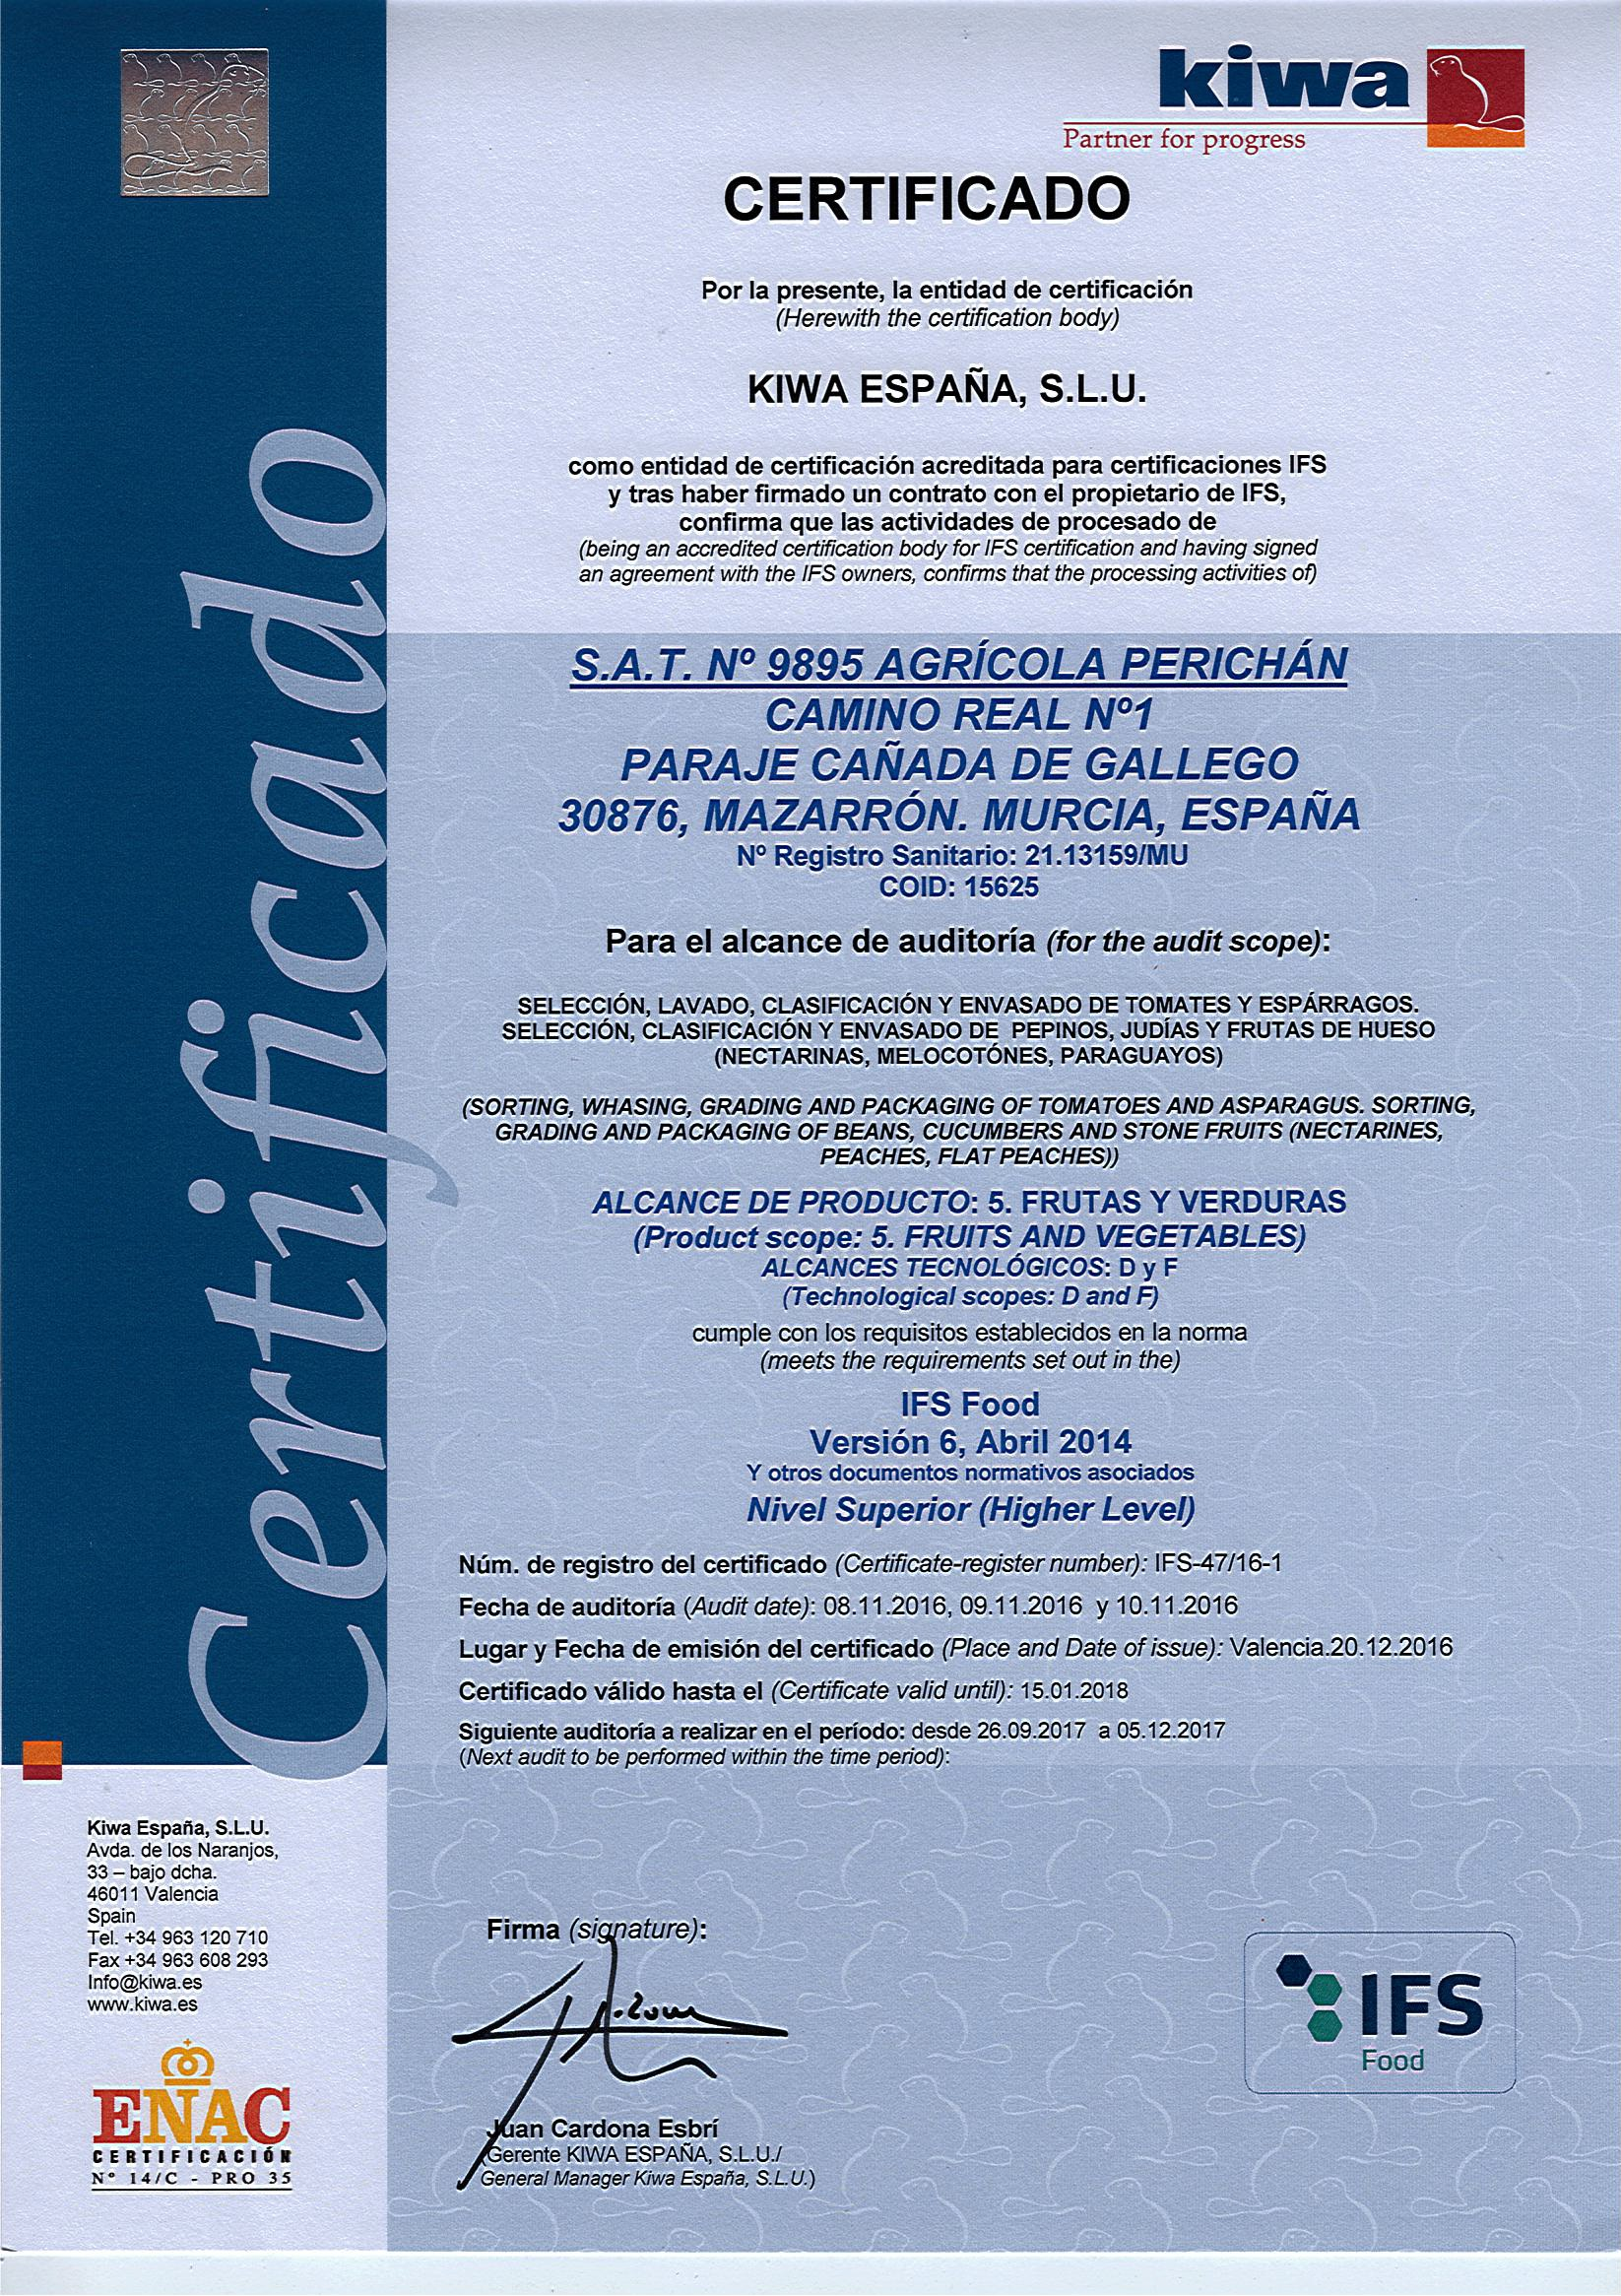 Certificado IFS FOOD SAT9895 AGRICOLA PERICHAN